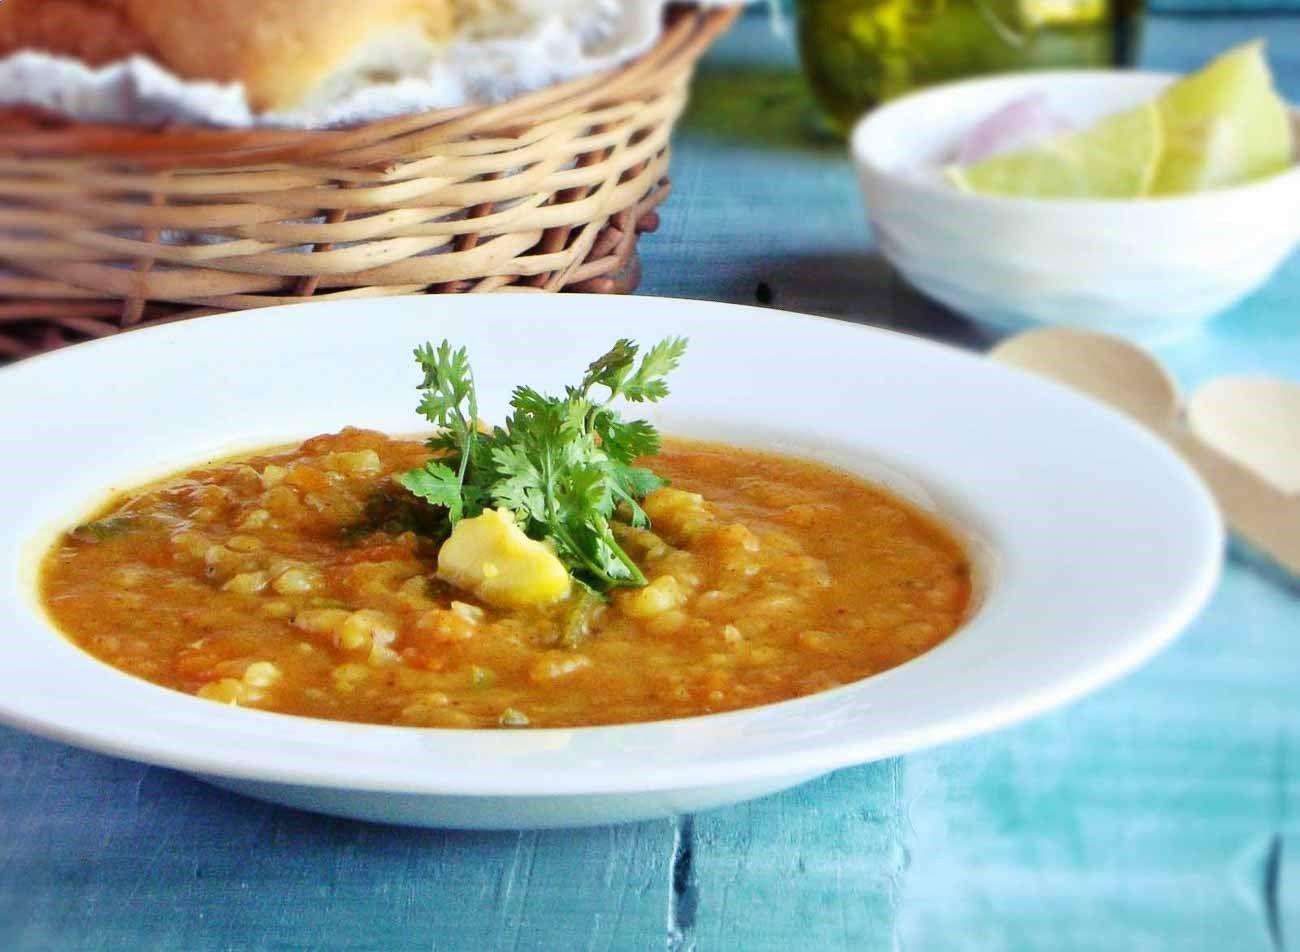 Paneer pav bhaji recipe delicious indian street food dinner food paneer pav bhaji recipe delicious indian street forumfinder Images